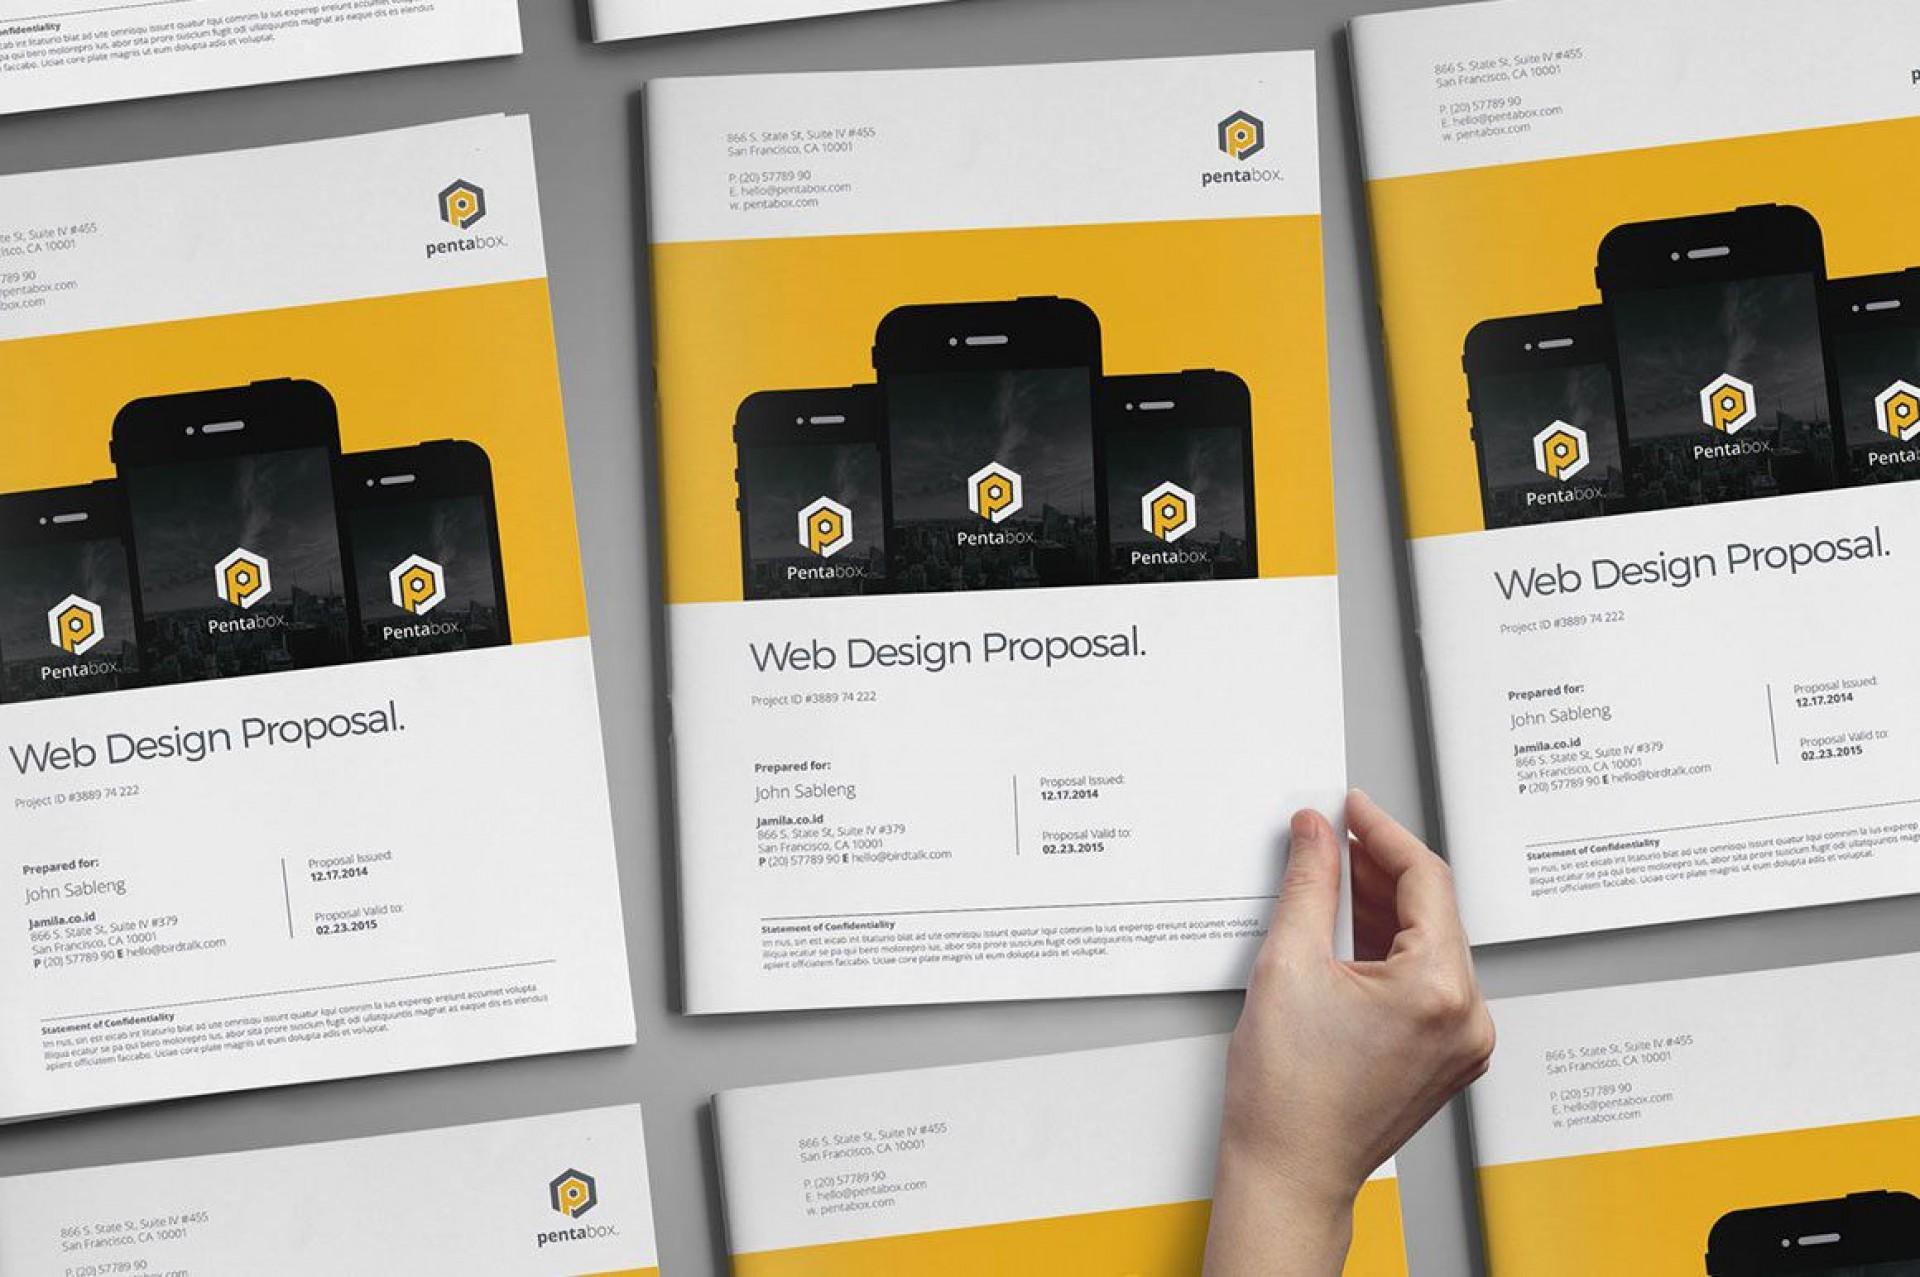 003 Impressive Web Design Proposal Template Free Download Picture 1920